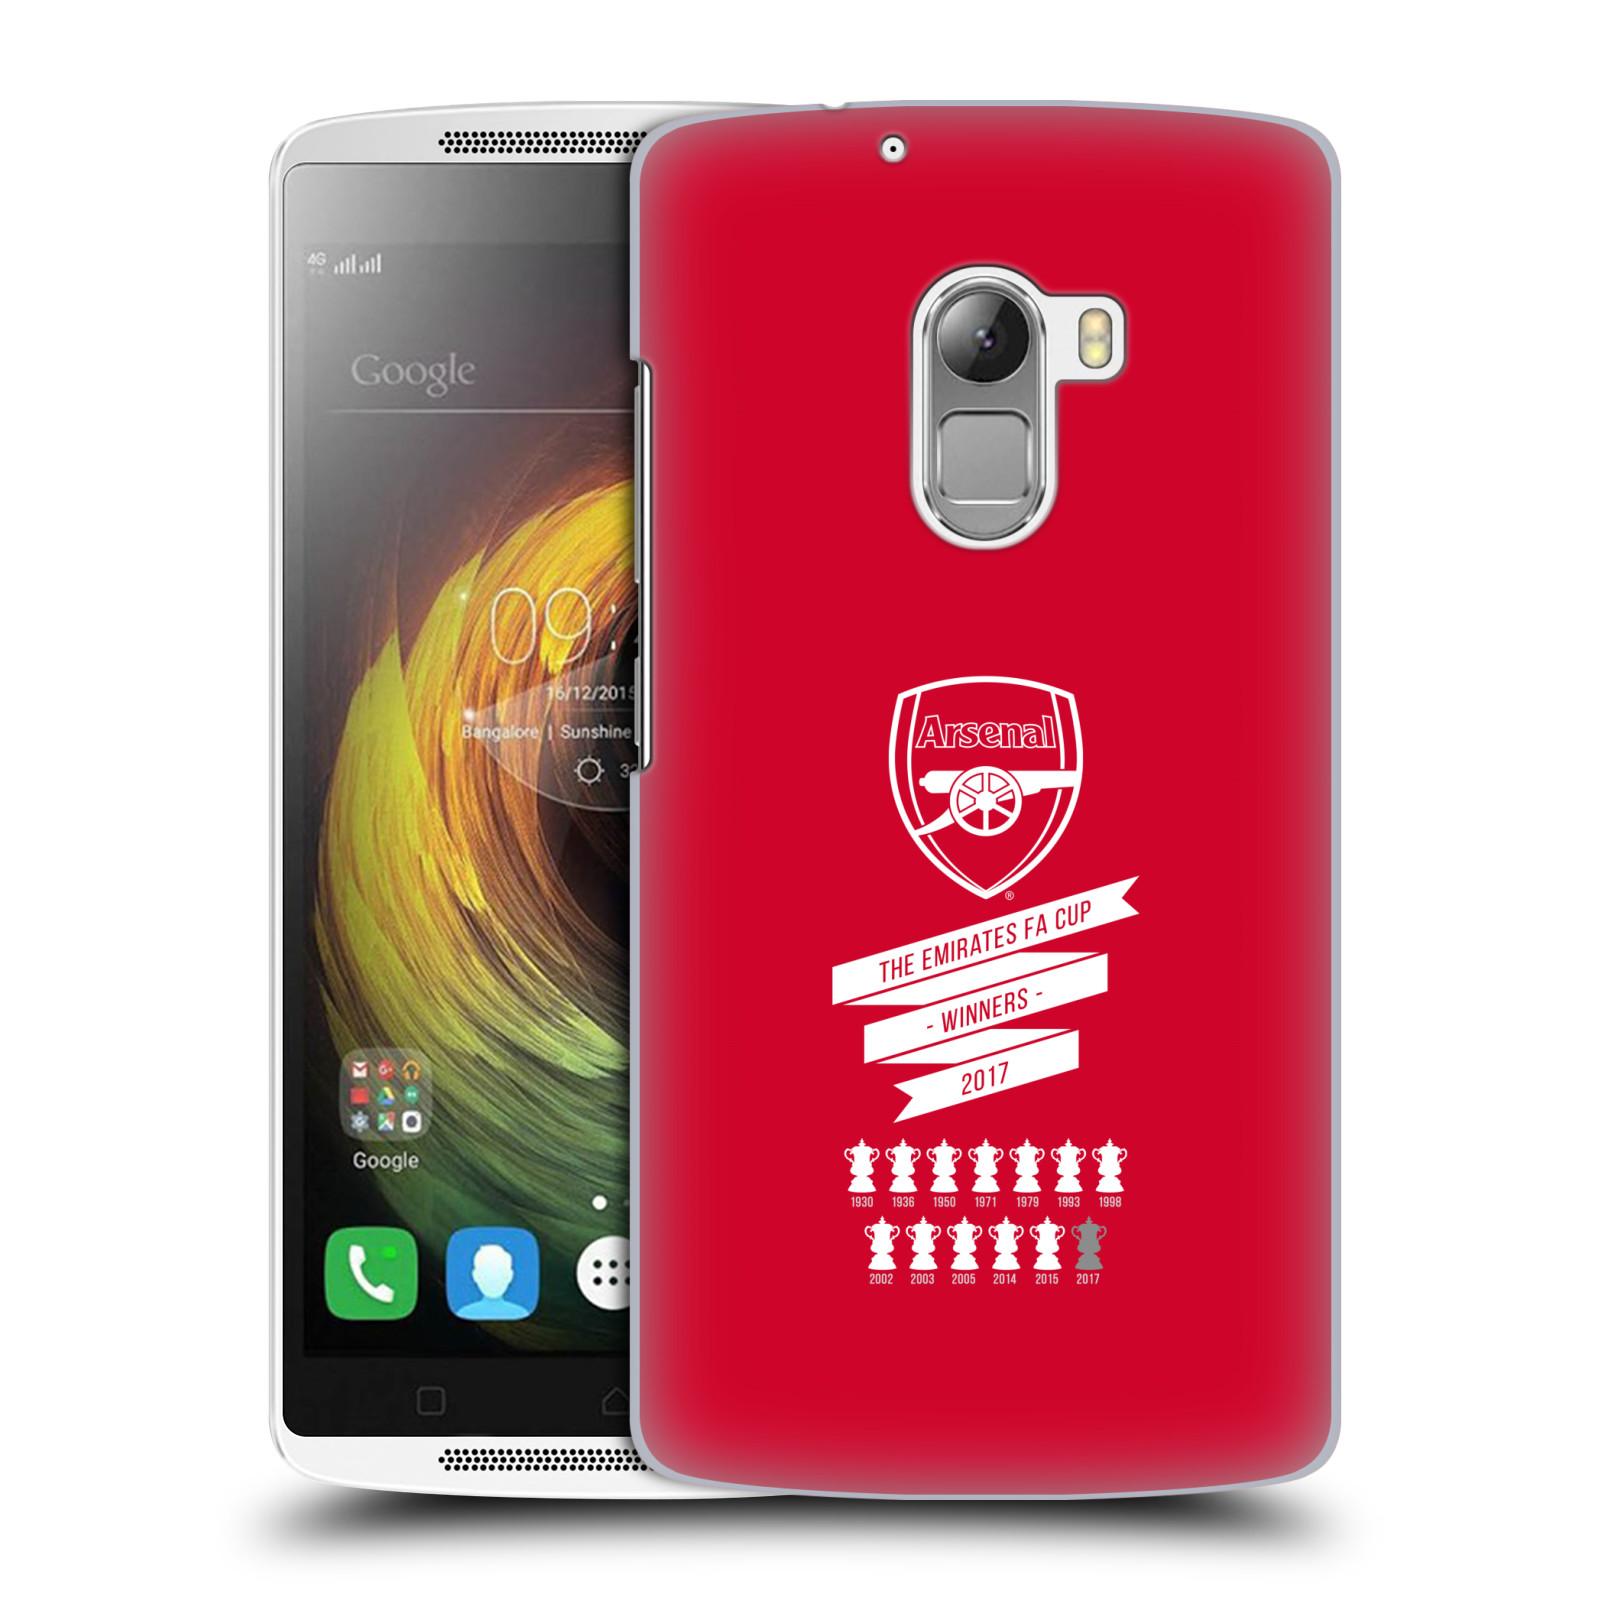 Plastové pouzdro na mobil Lenovo A7010 - Head Case - Arsenal FC - 13 Wins